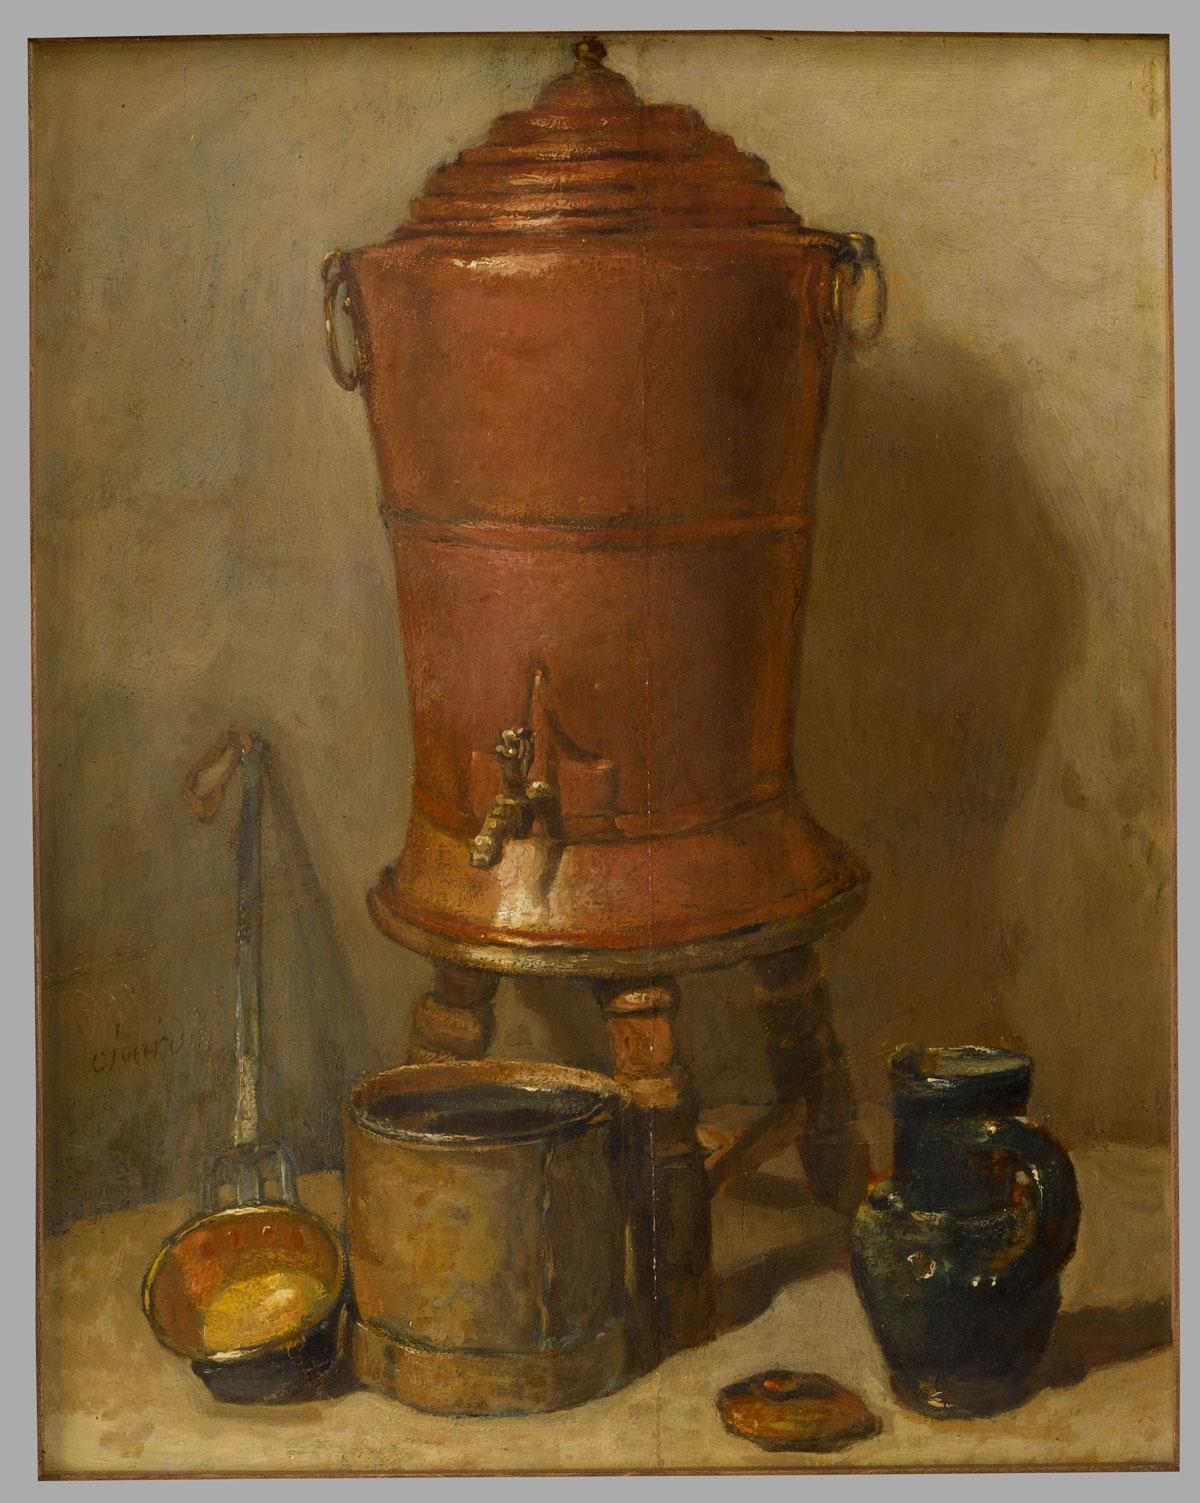 La Fontaine de cuivre, Jean-Simeon Chardin, Barnes Foundation